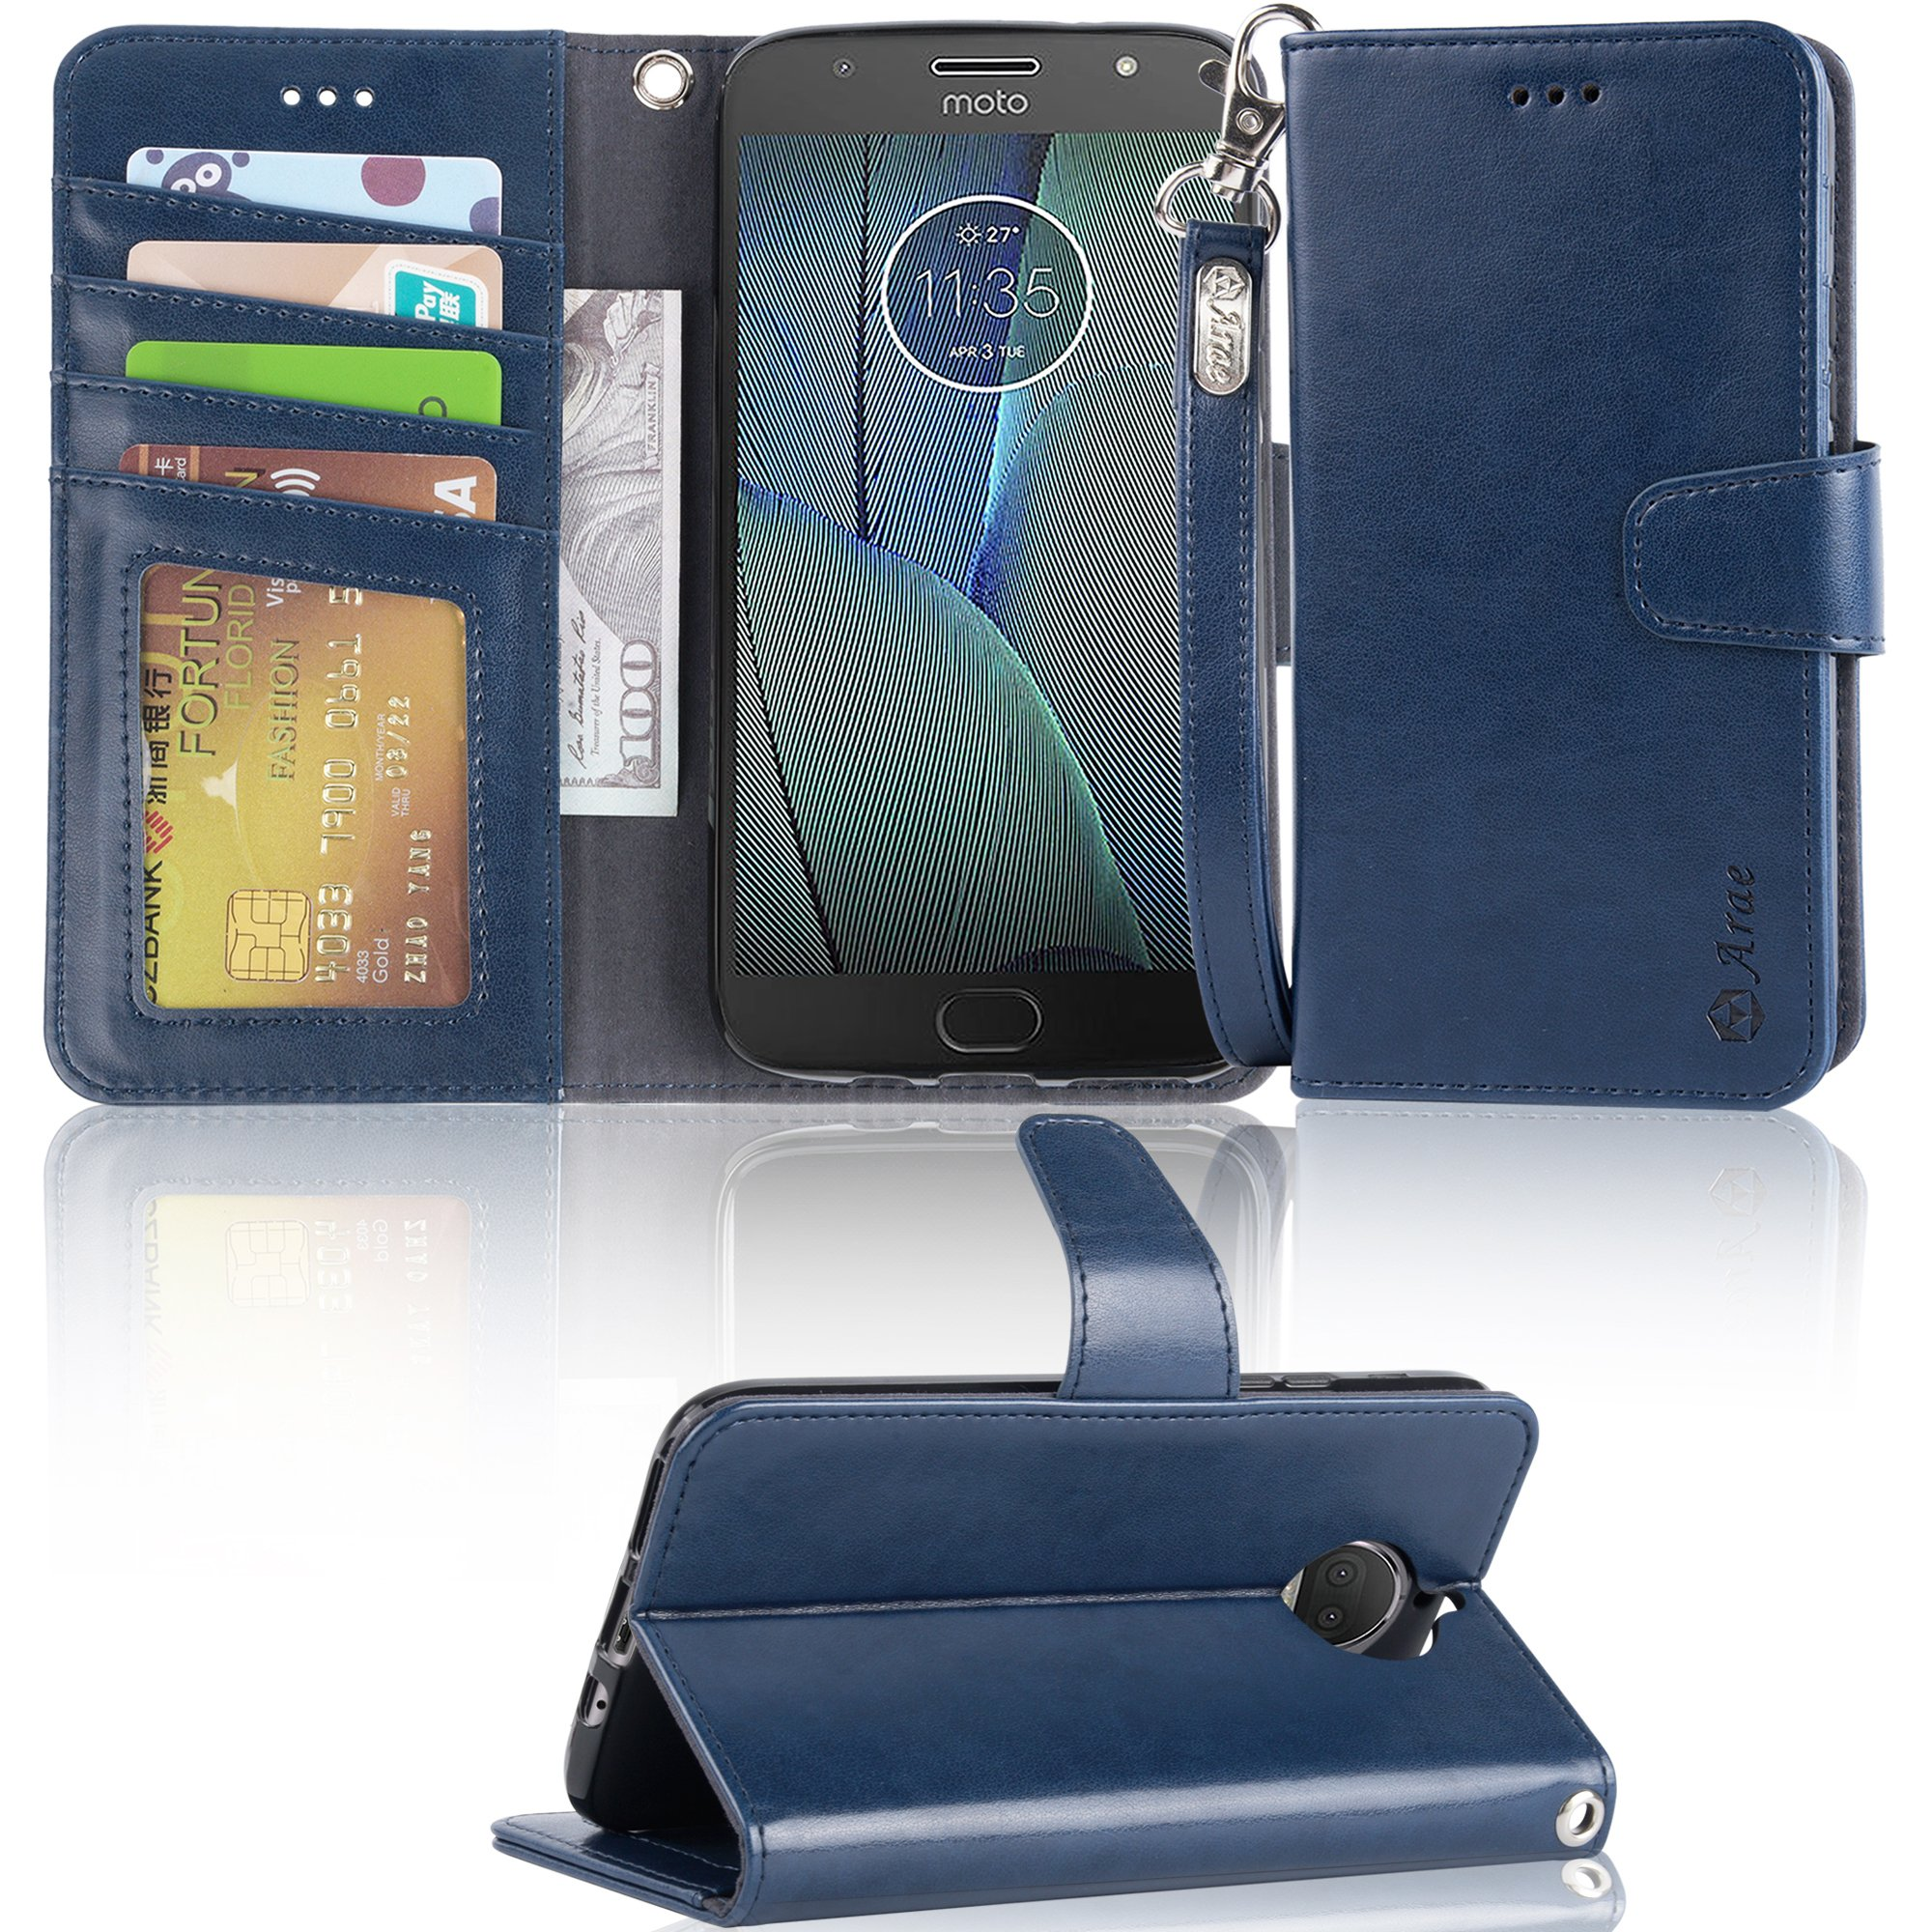 Moto G5S plus Case,Moto G5S plus wallet Case,Arae [Wrist Strap] Flip Folio [Kickstand Feature] PU leather wallet case with ID&Credit Card Pockets For Moto G5S plus (Not for G5S,Not for G5 plus),blue